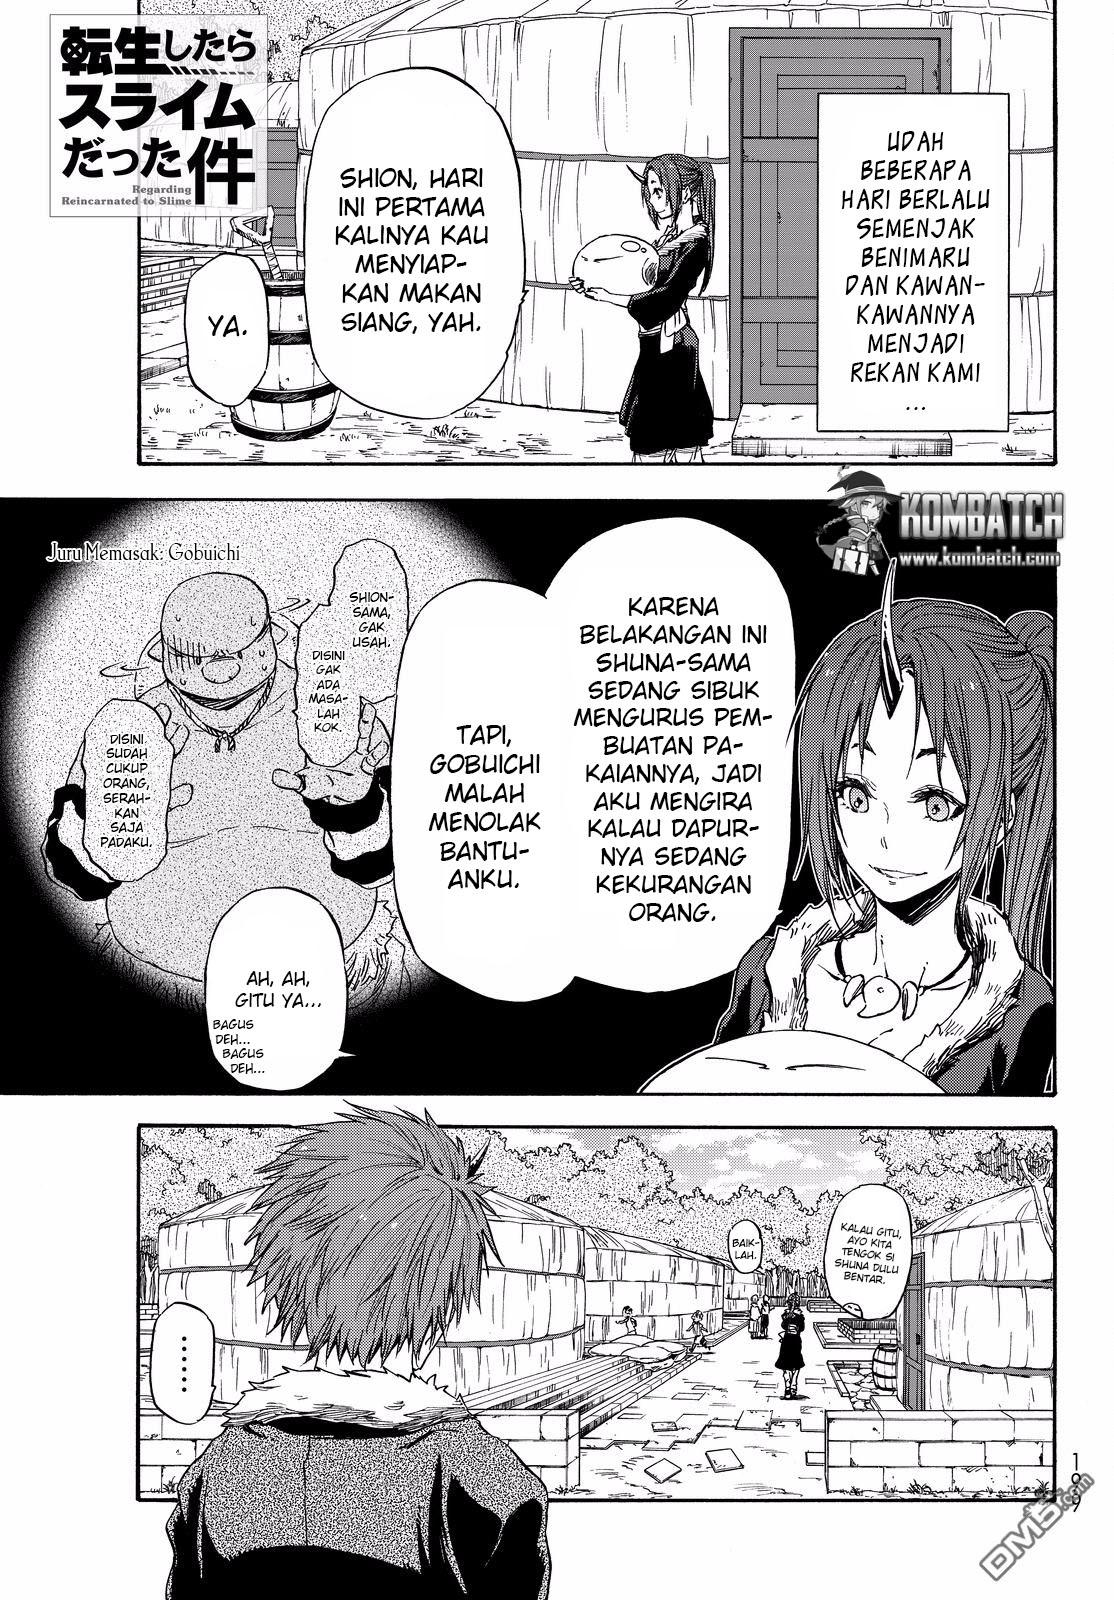 Baca Manga Tensei Shitara Slime Datta Ken Chapter 16 Bahasa Indonesia